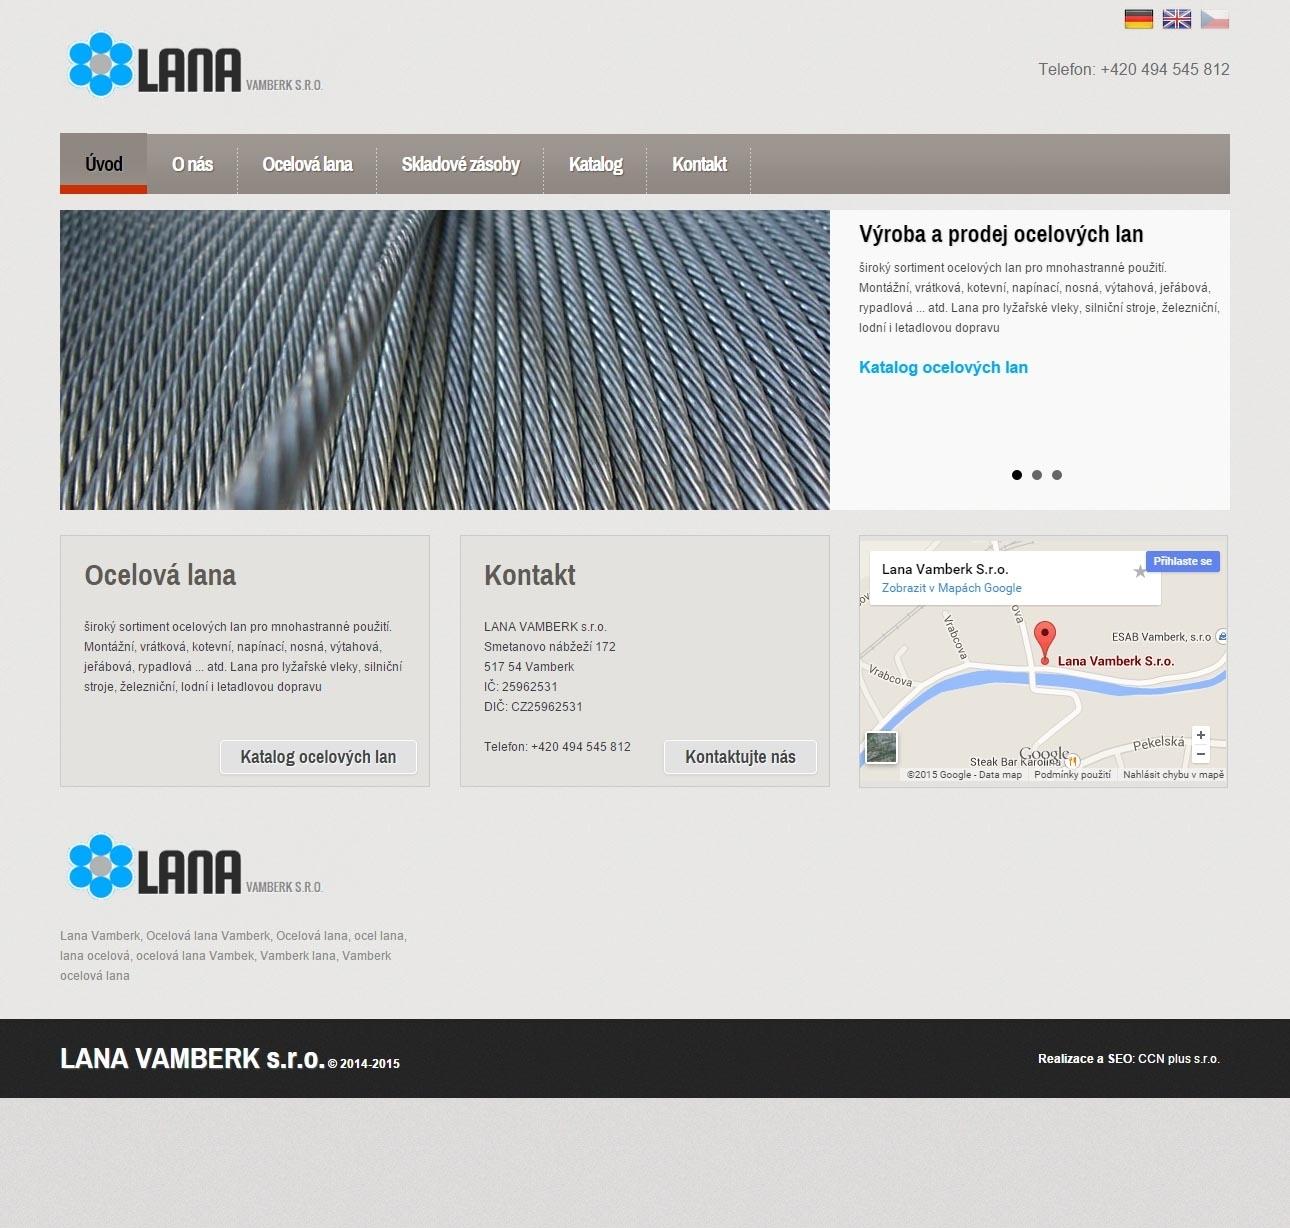 Lana Vamberk - Výroba a prodej ocelových lan